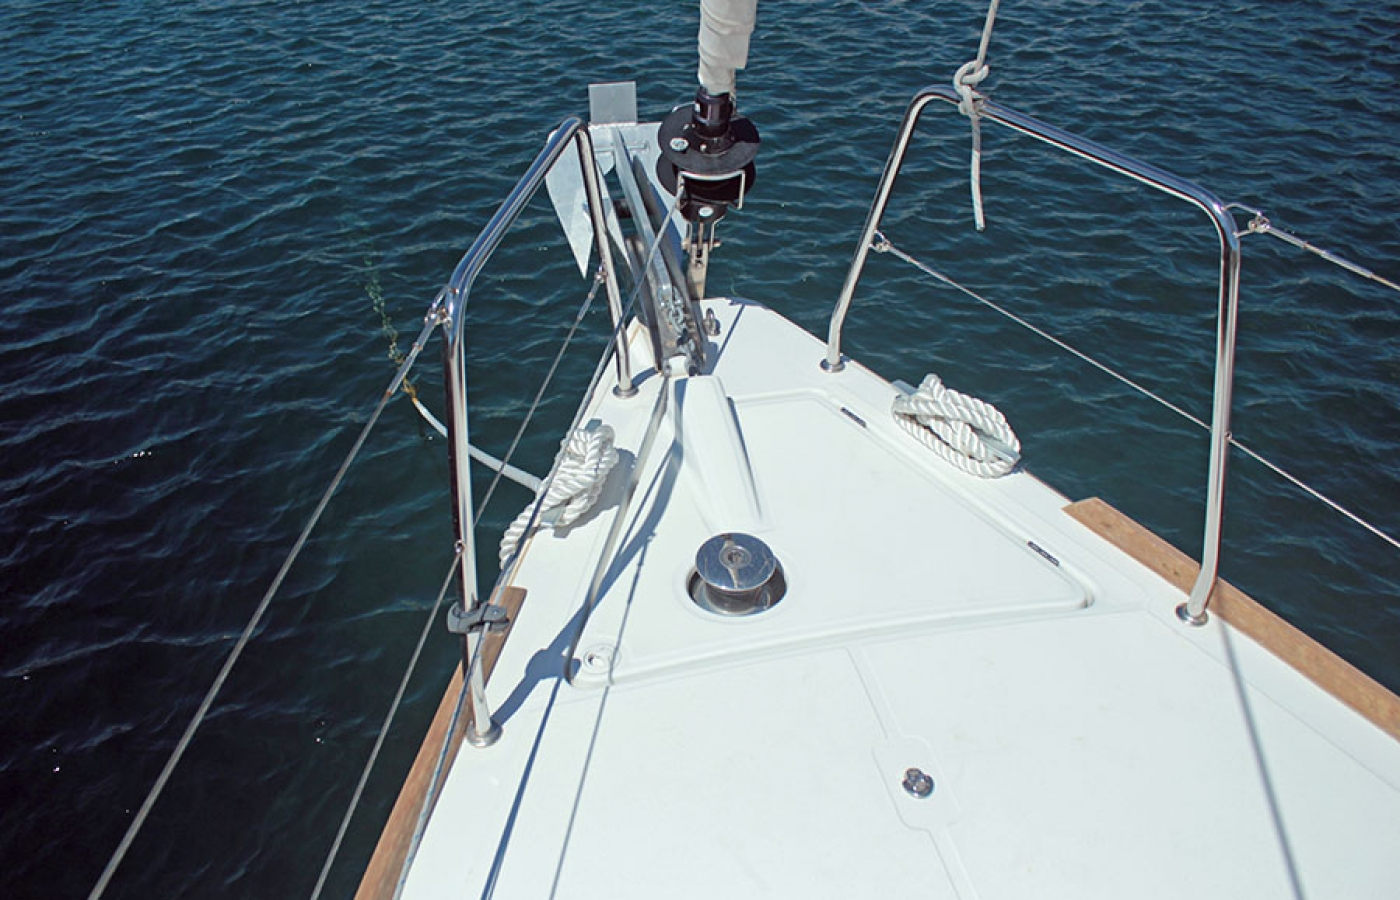 Beneteau Oceanis 38.1. FREEDOM  cruising the mediterrabean water